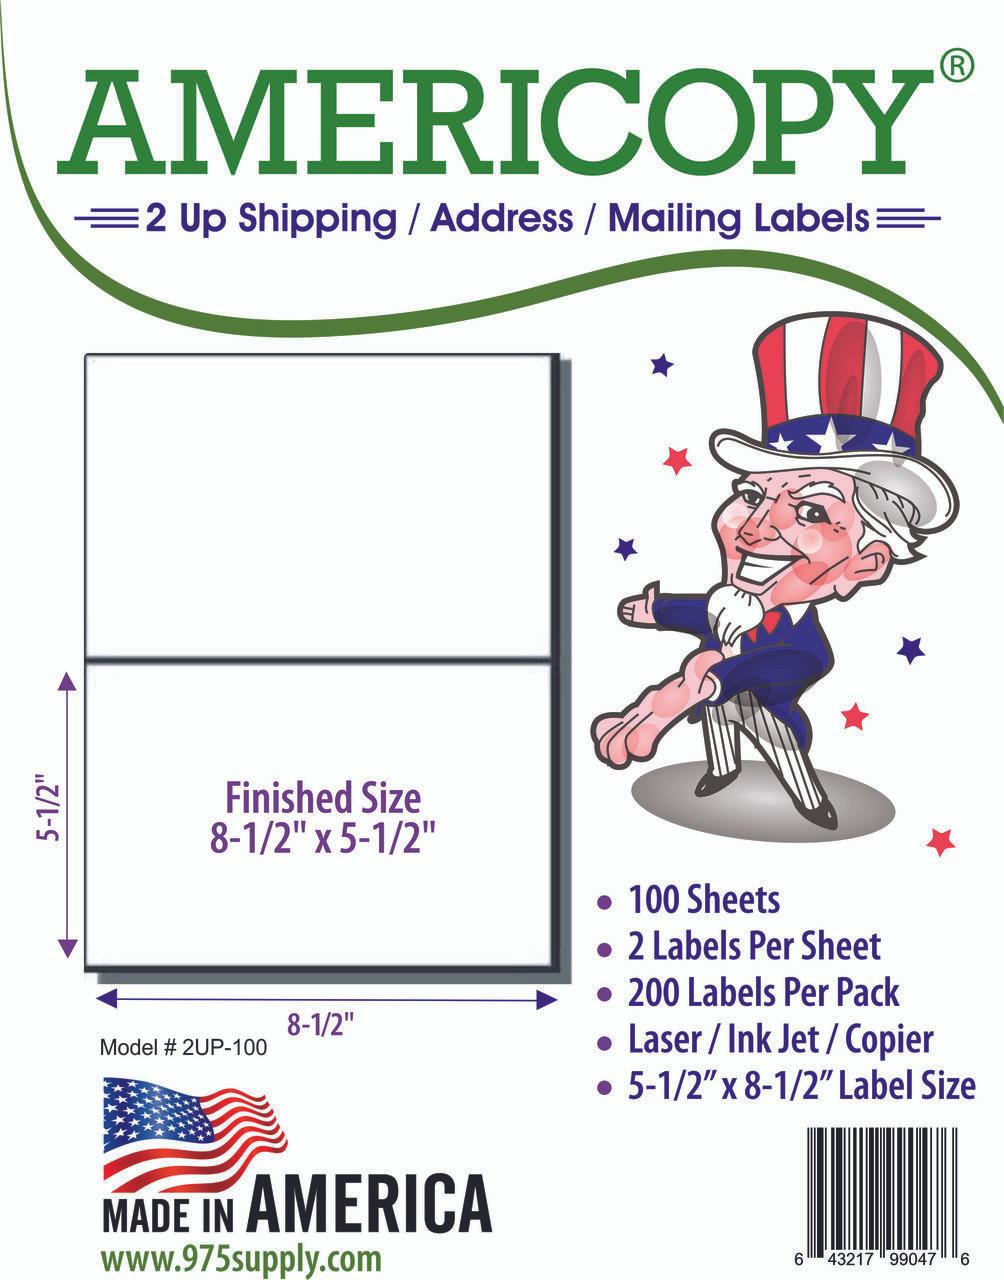 8b266992c50c Americopy Labels - Half Sheet Labels - 8-1/2